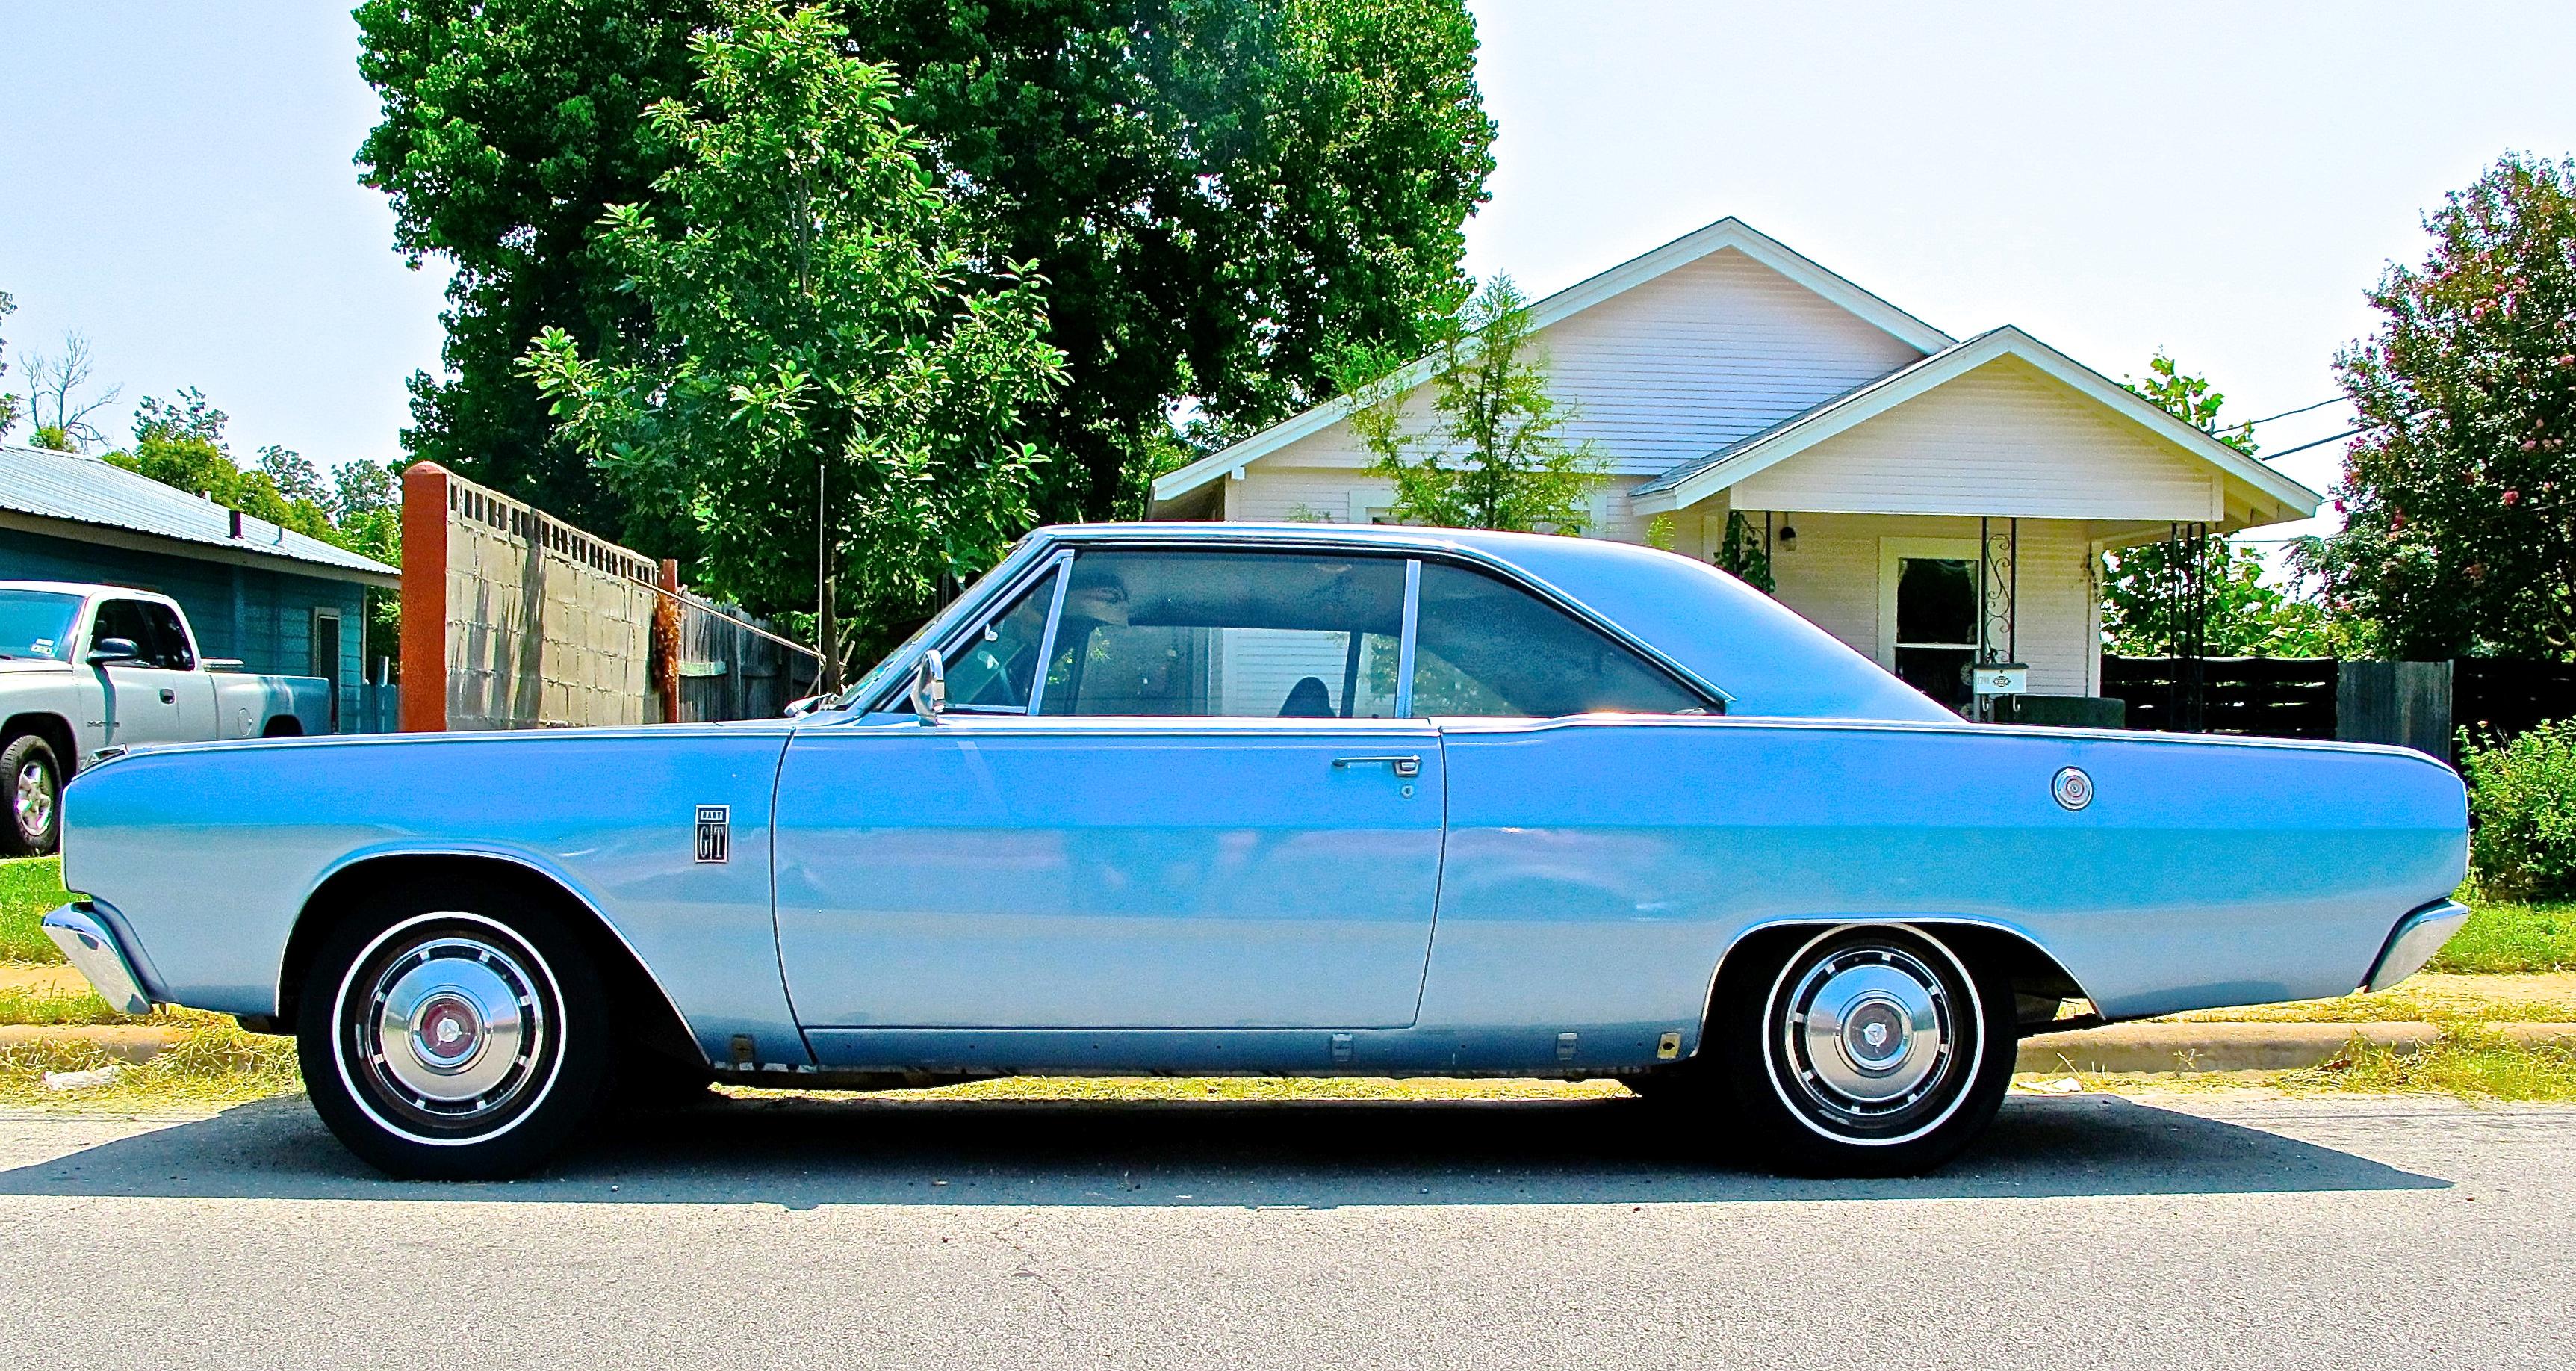 1967 Dodge Dart GT in Austin TX side | ATX Car Pictures ...